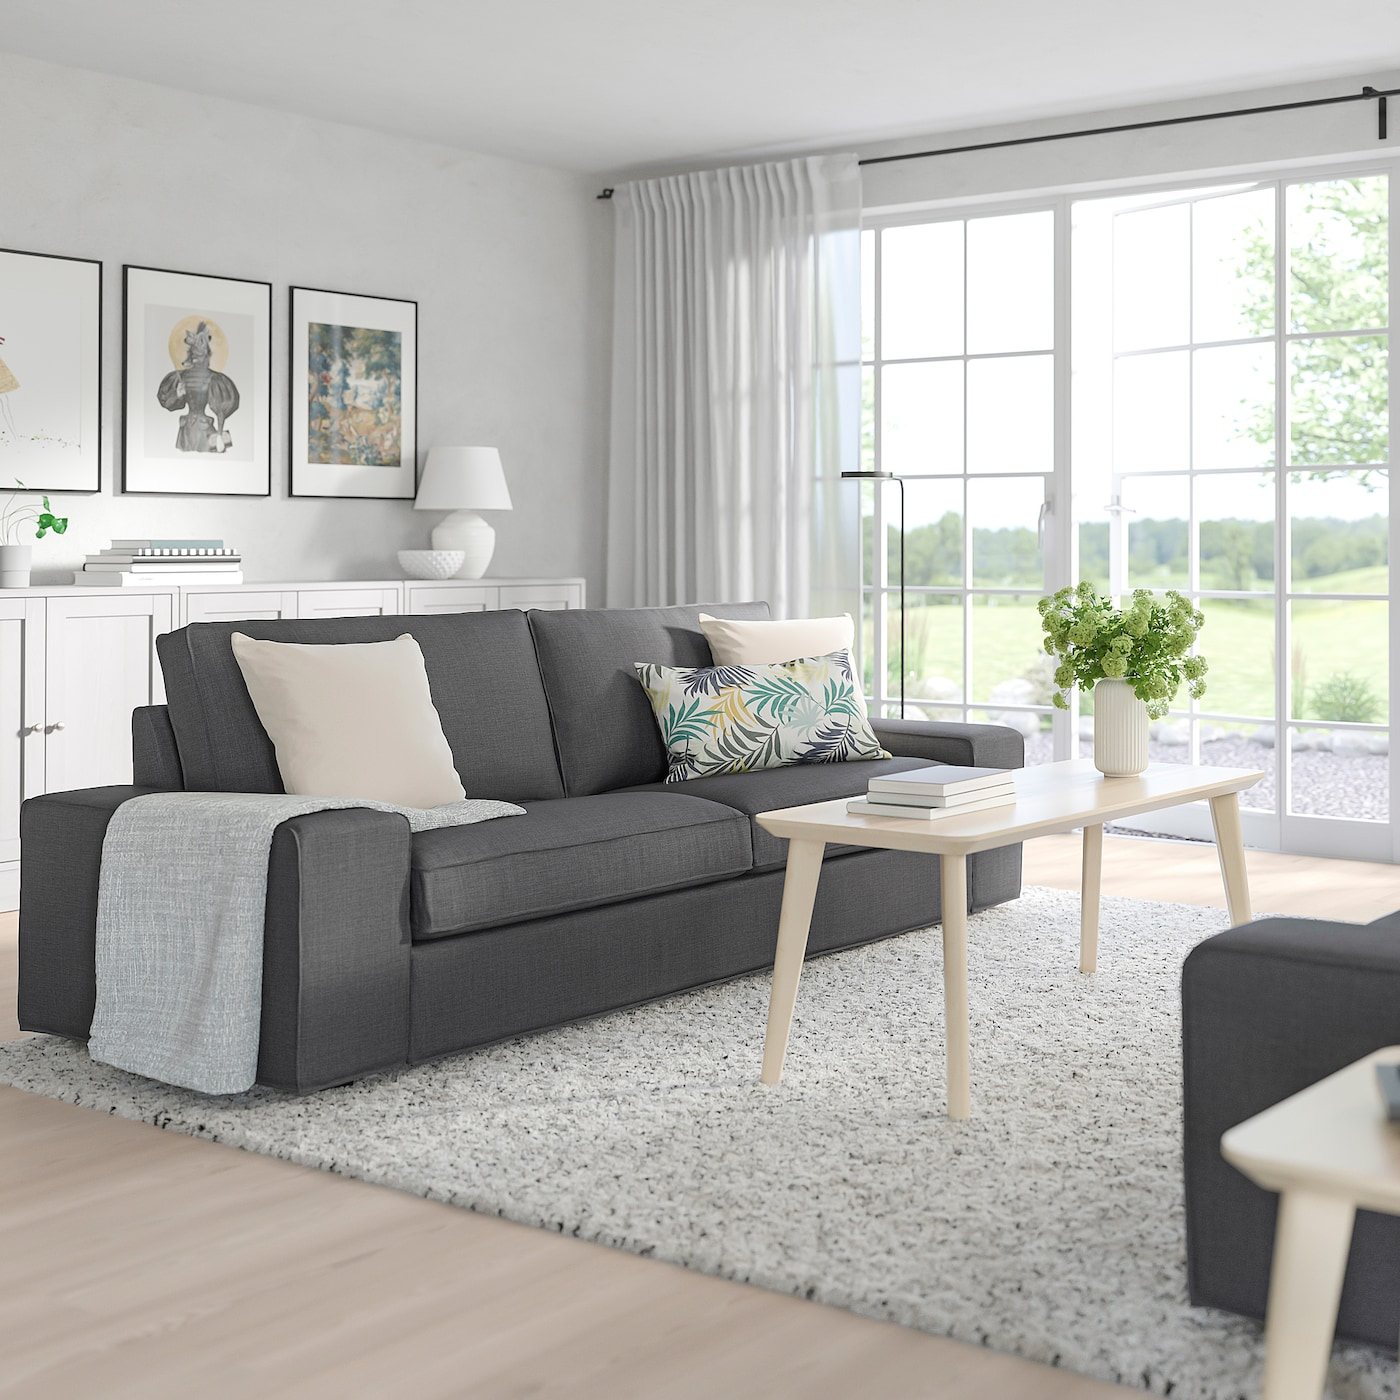 KIVIK Sofa, Skiftebo Dark Gray - IKEA